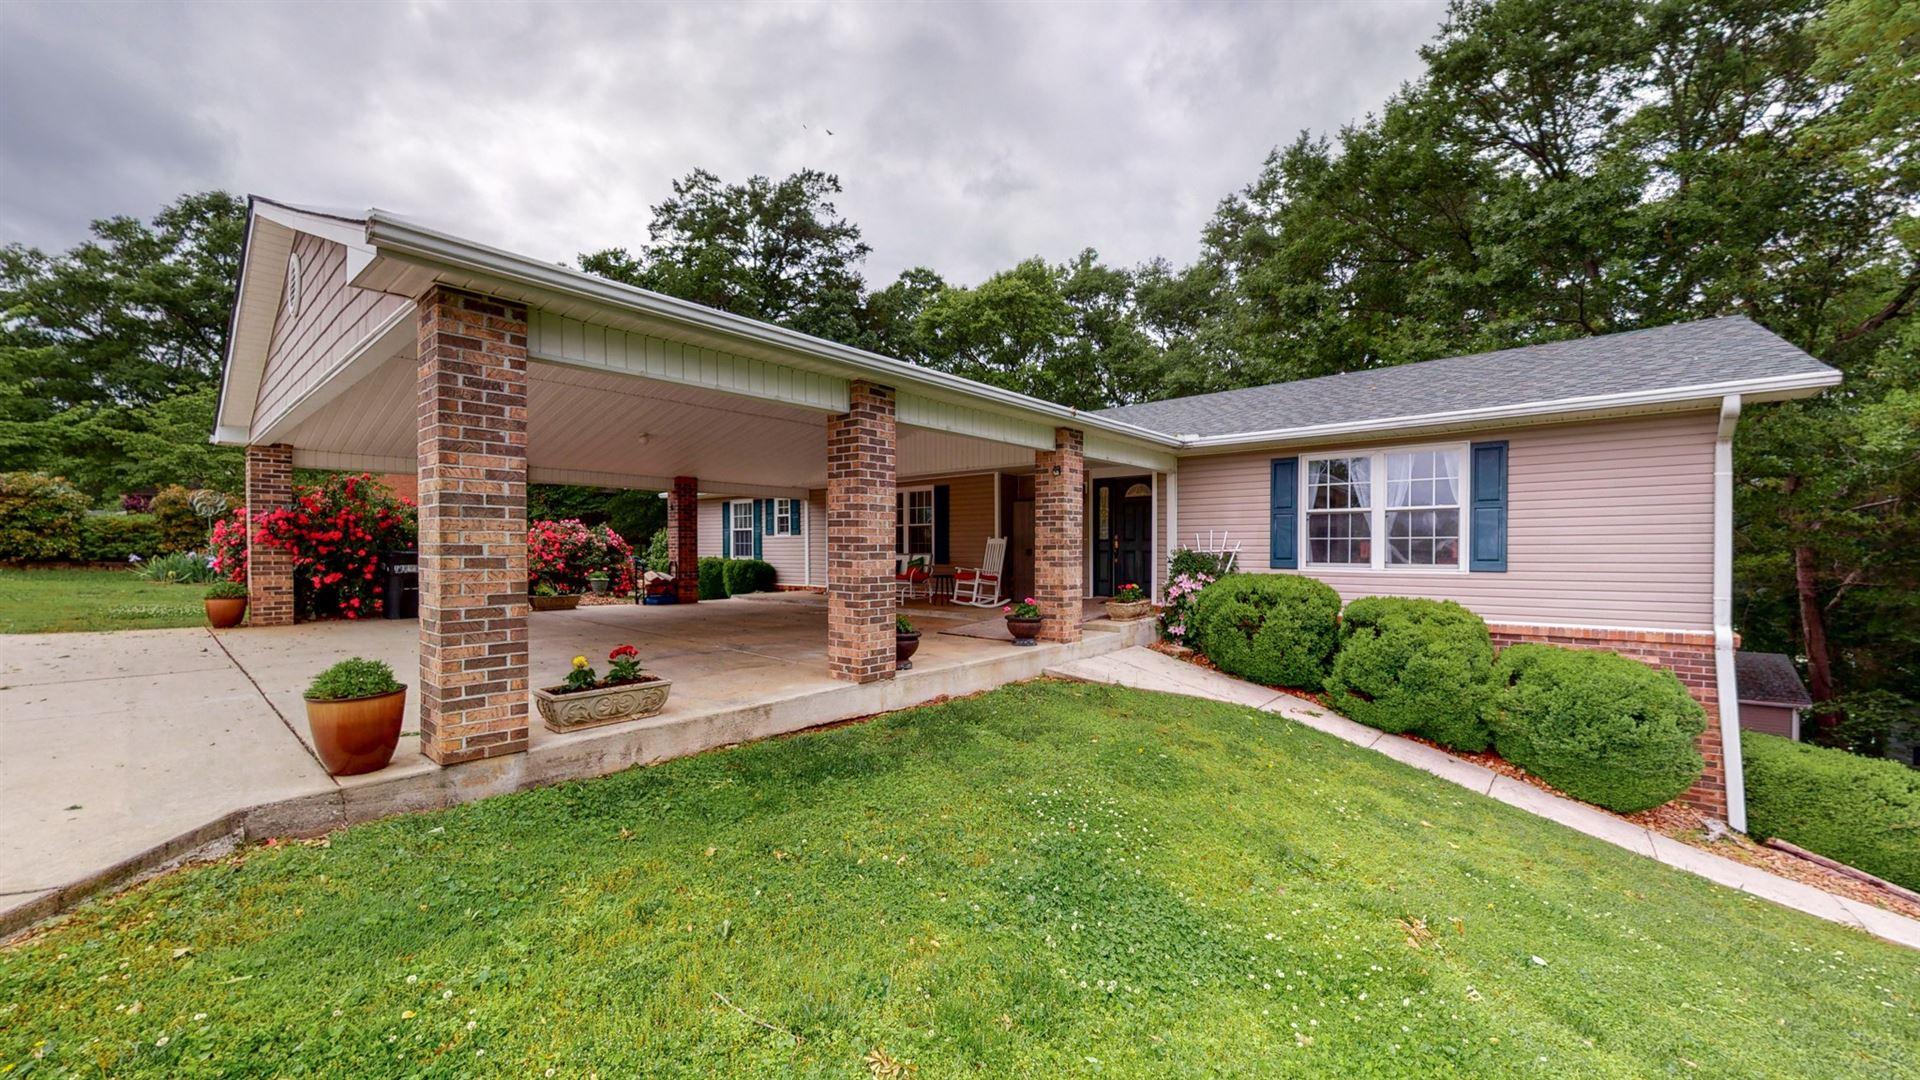 182 Loop Dr, Winchester, TN 37398 - MLS#: 2153127